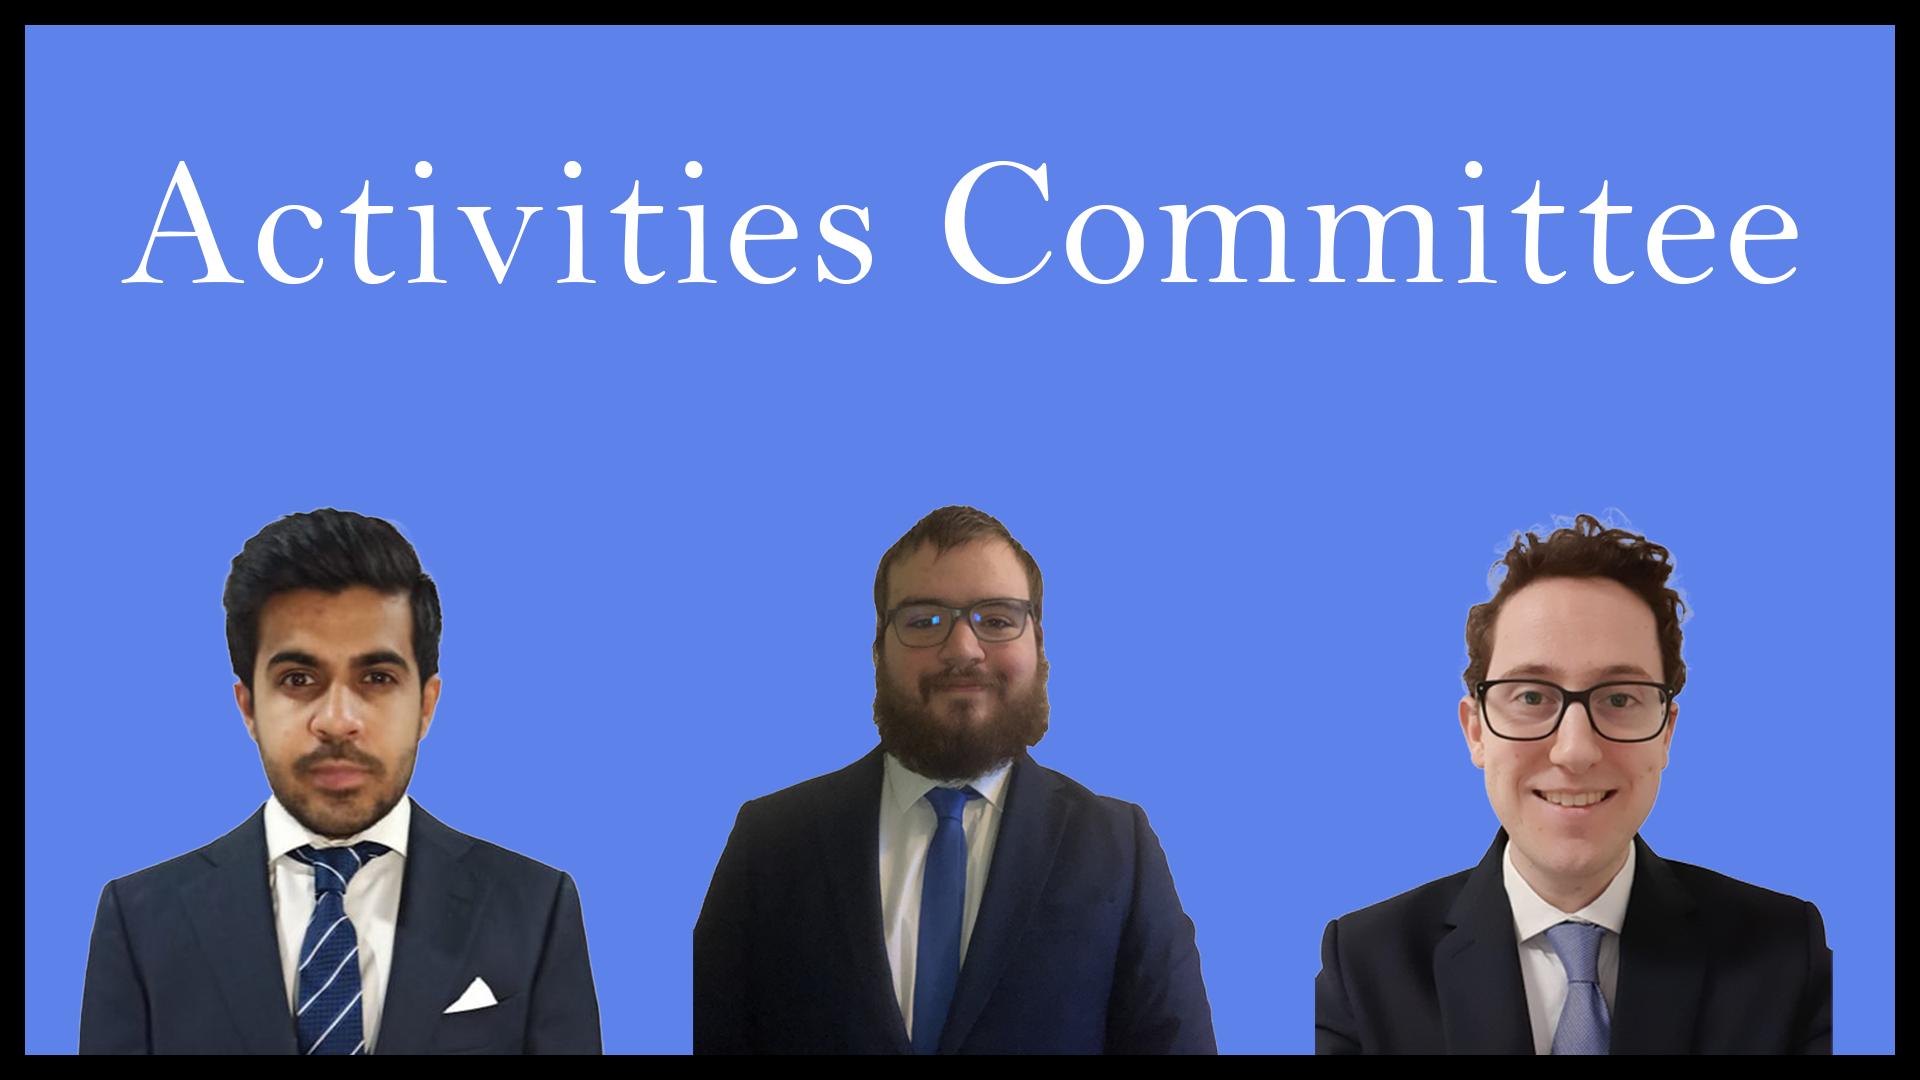 Committee Picture Intellectual Activities